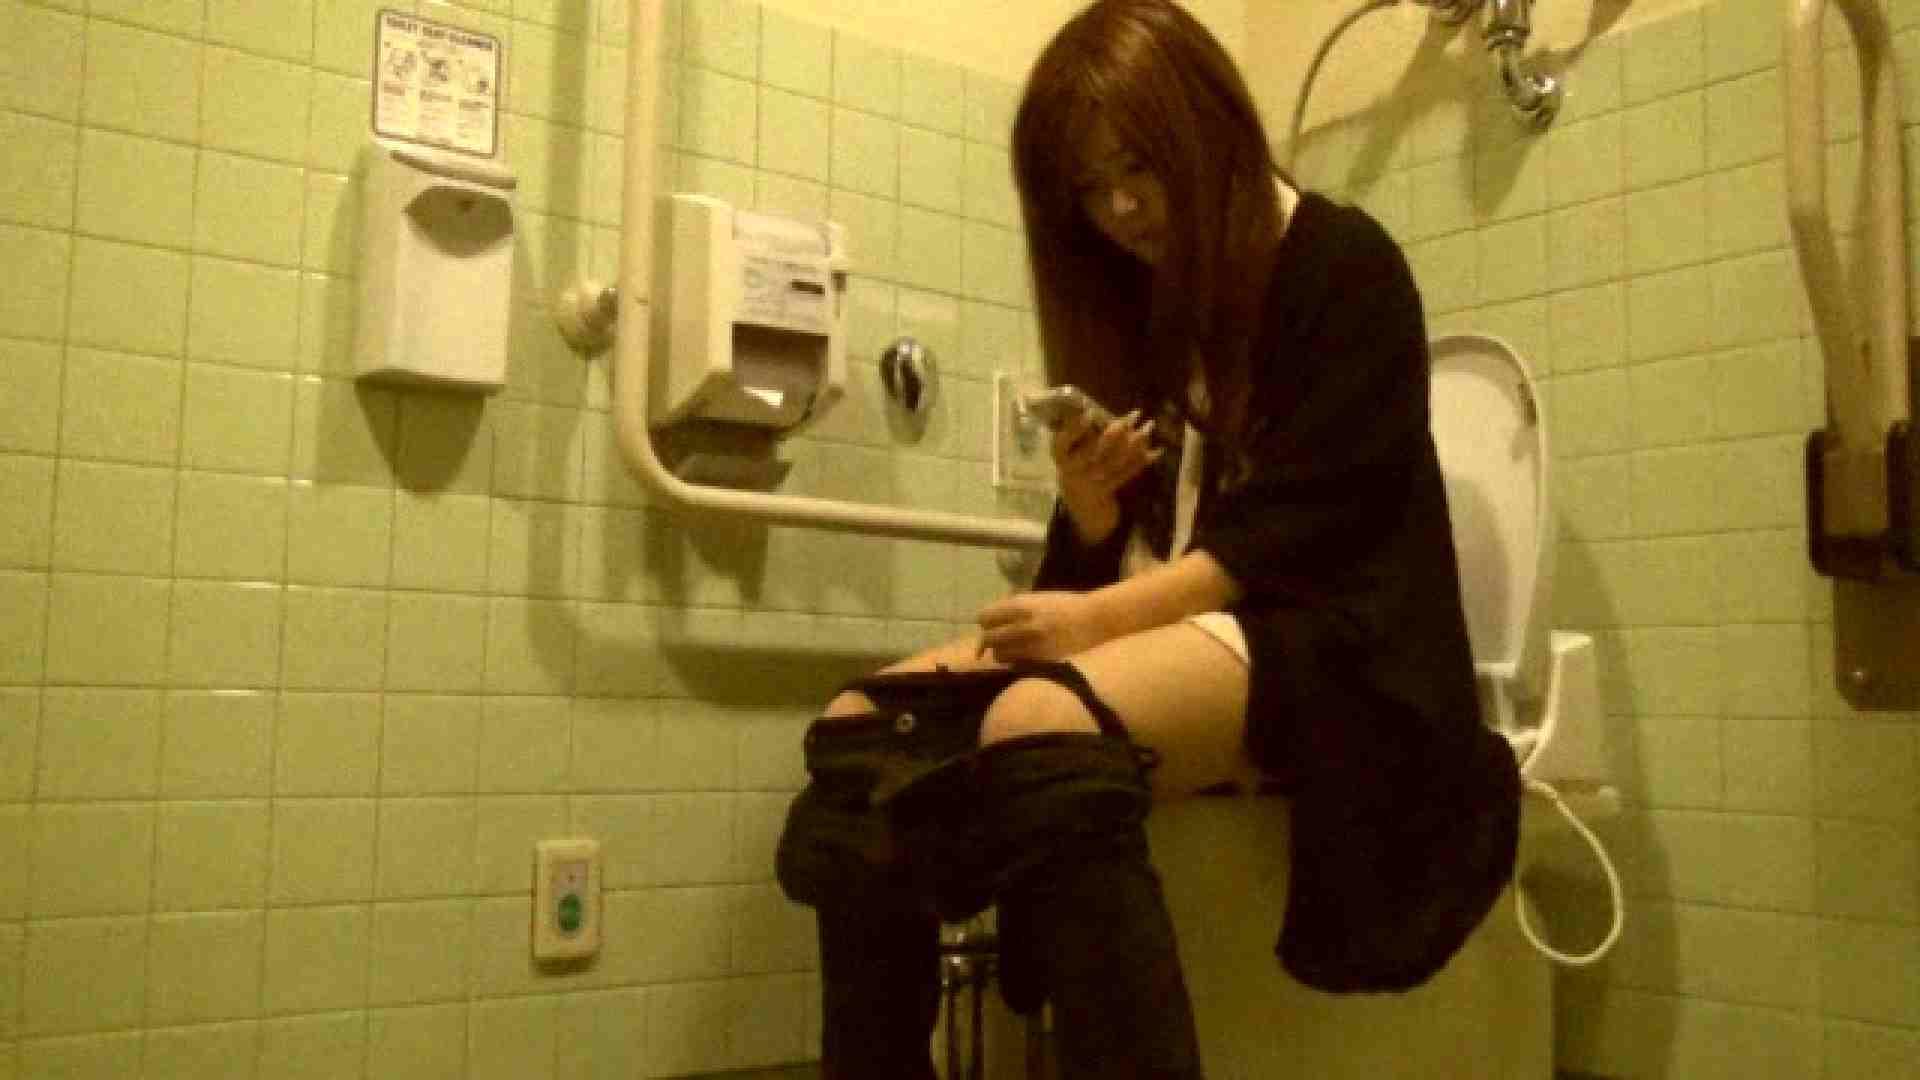 vol.26 【SKちゃん(洗面所)】ガールズバー店員 19歳 キャバ嬢  72PIX 42